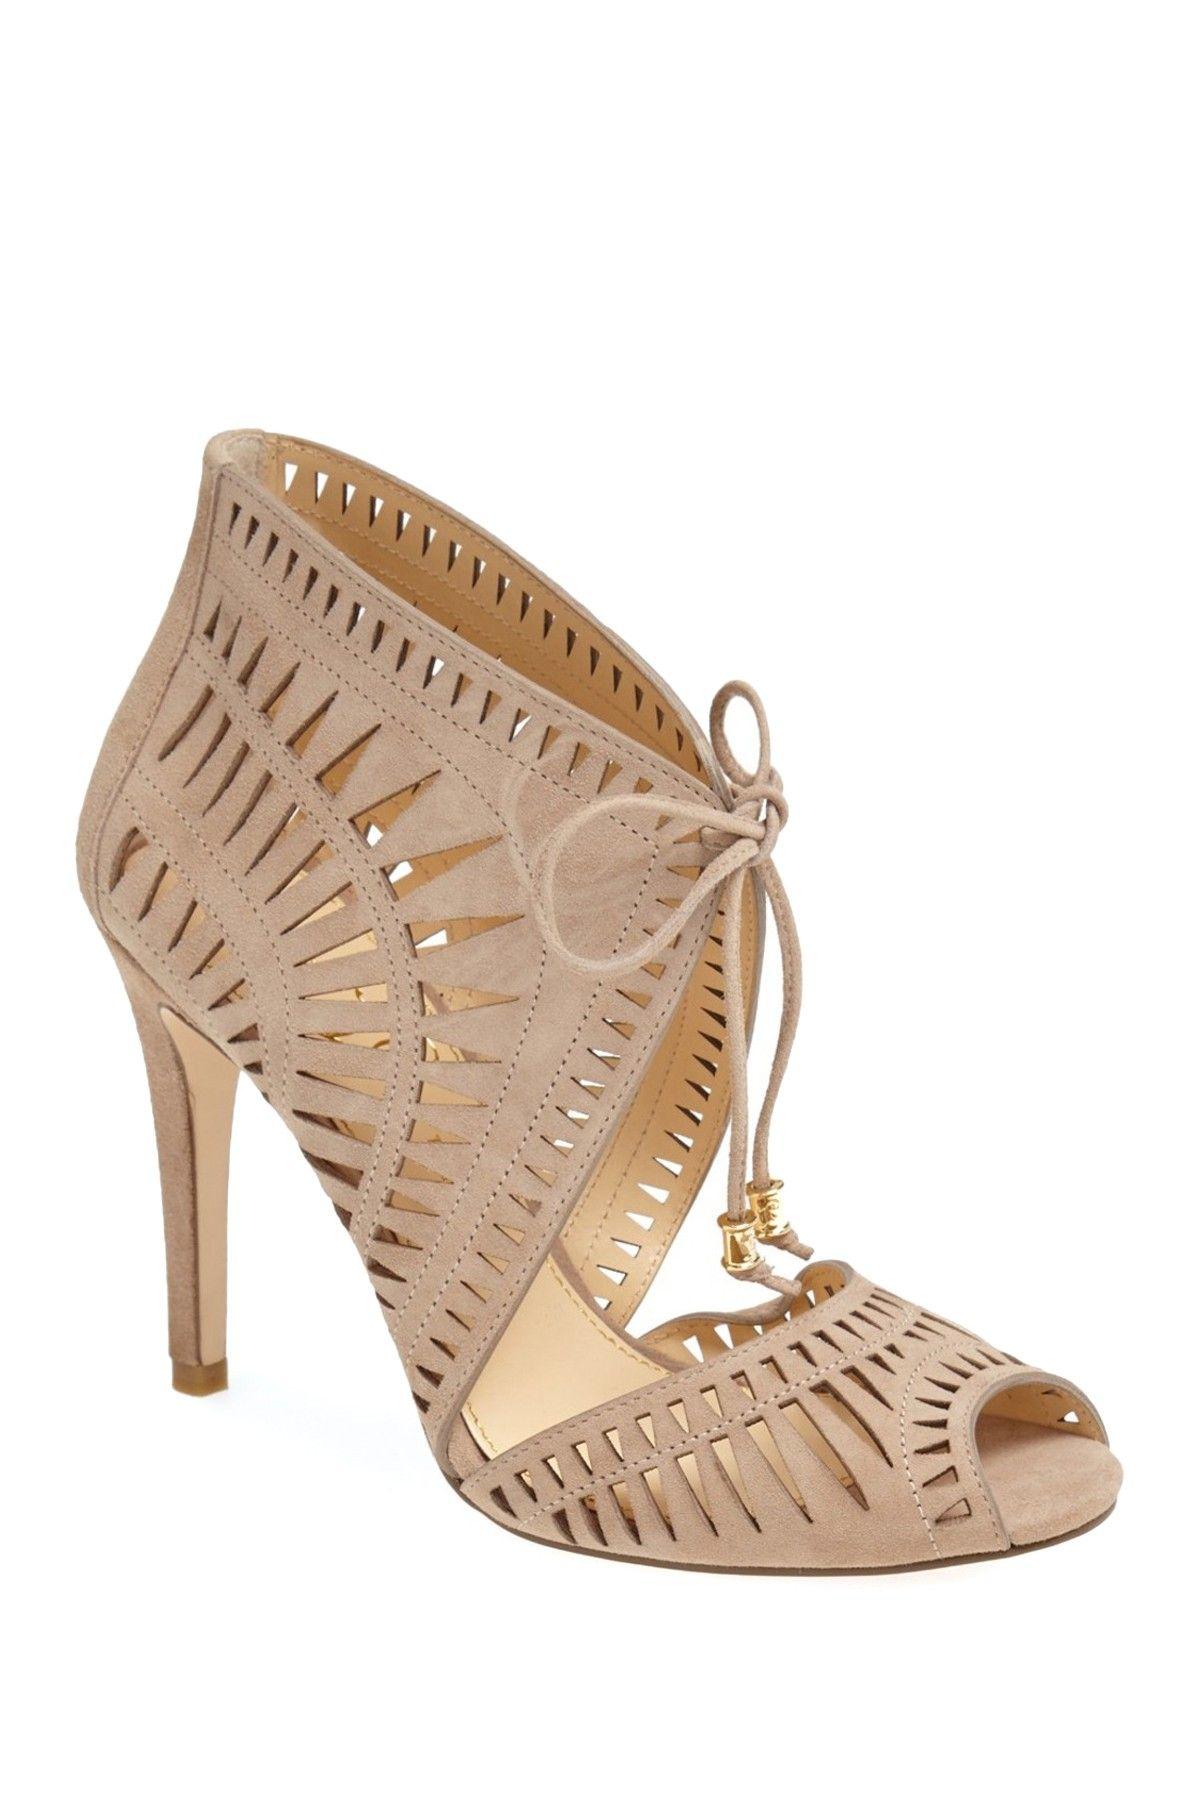 Delfino High Heel Sandal by Ivanka Trump on nordstrom rack